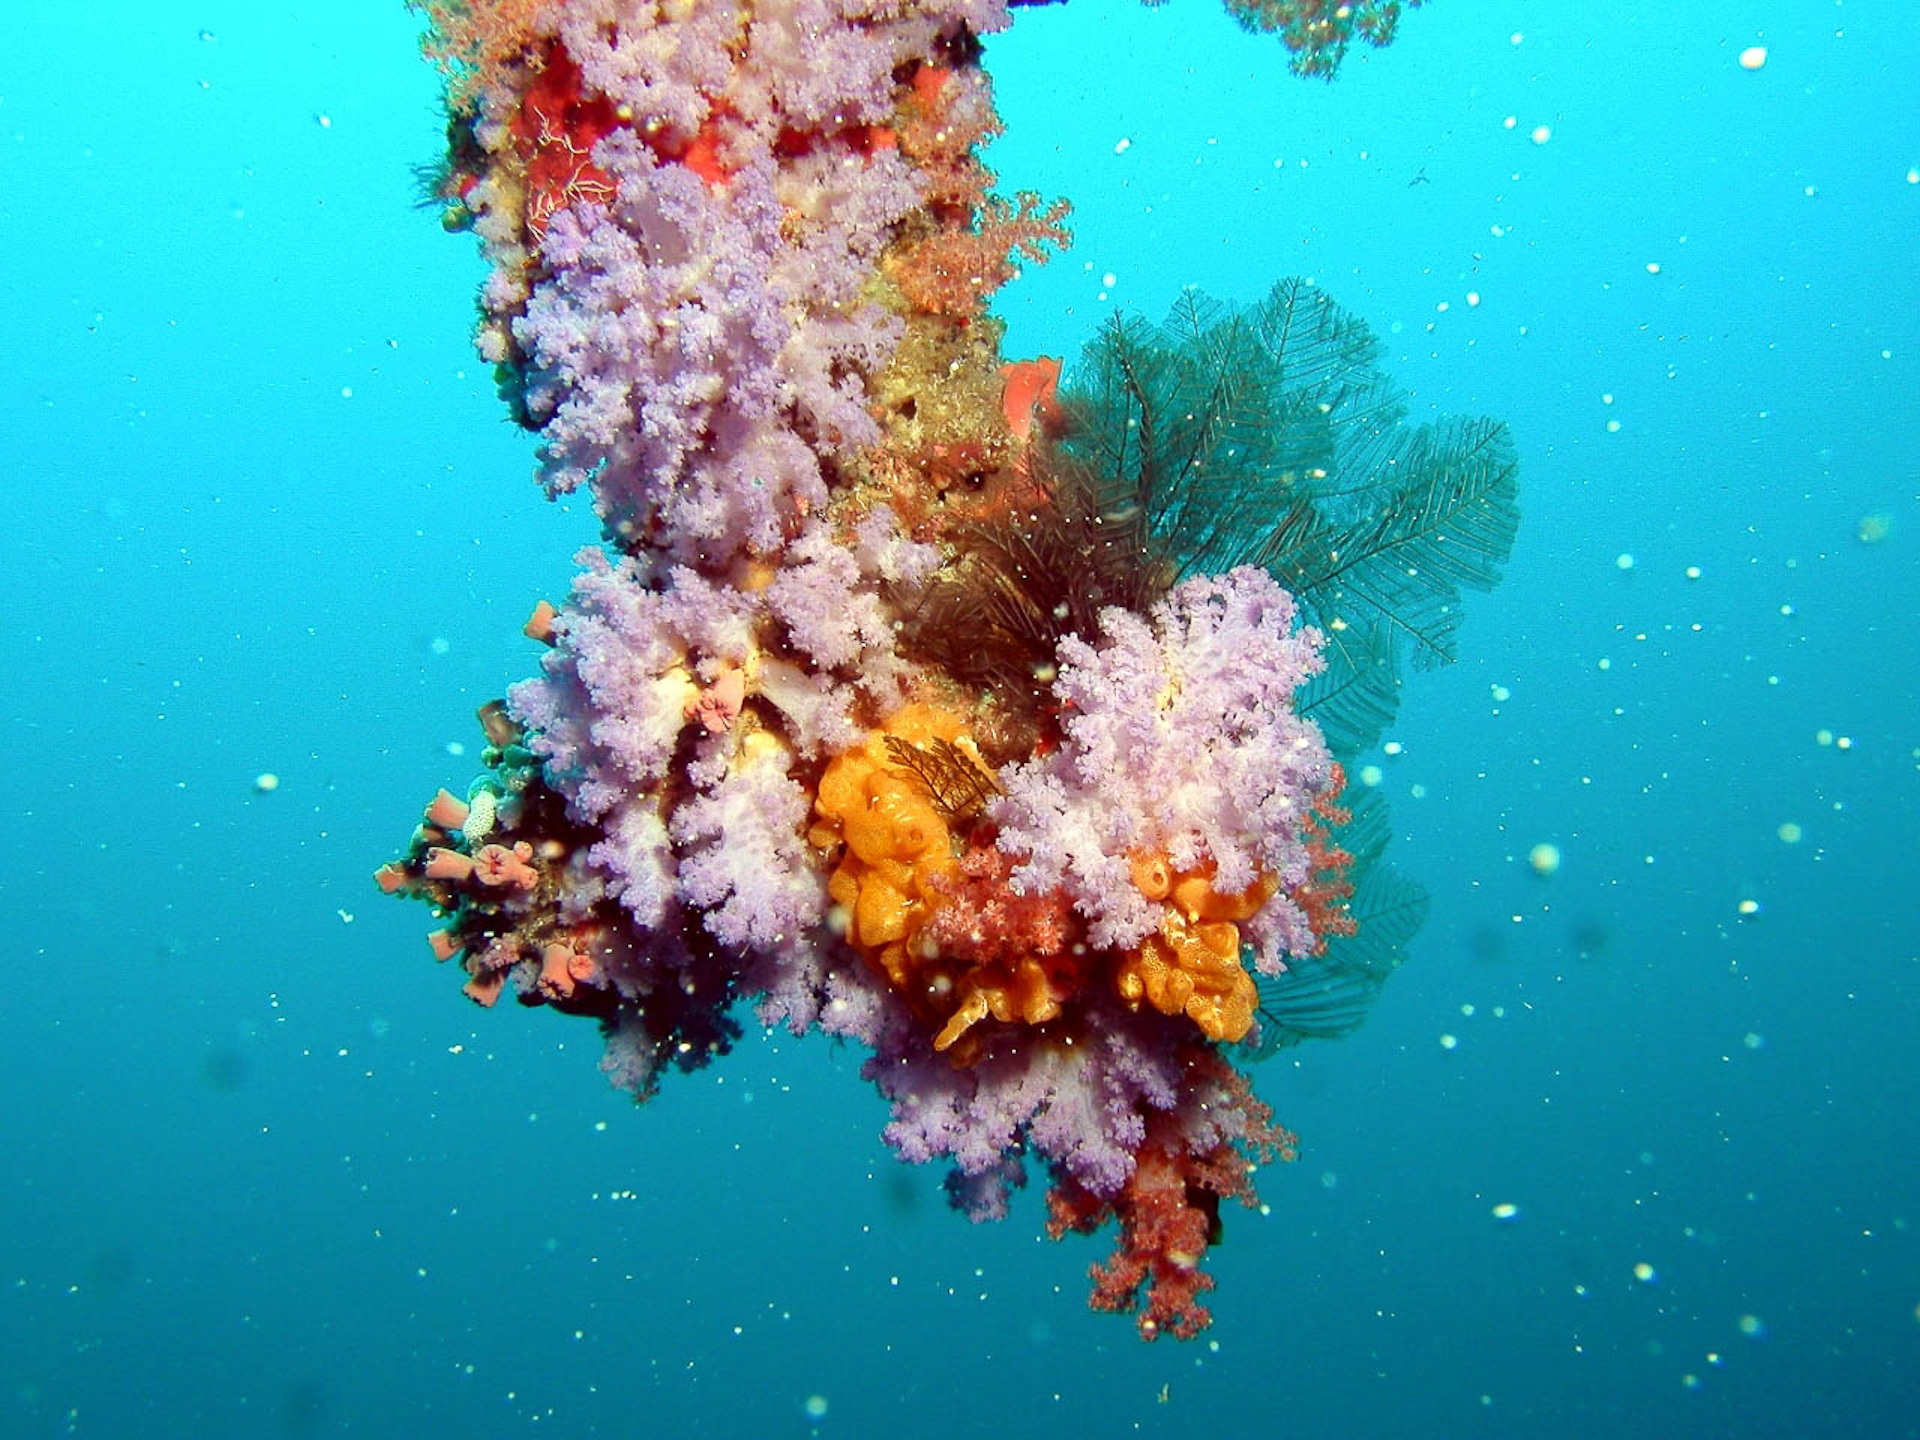 maldives-giusti596-maldives-underwater-coral.jpg